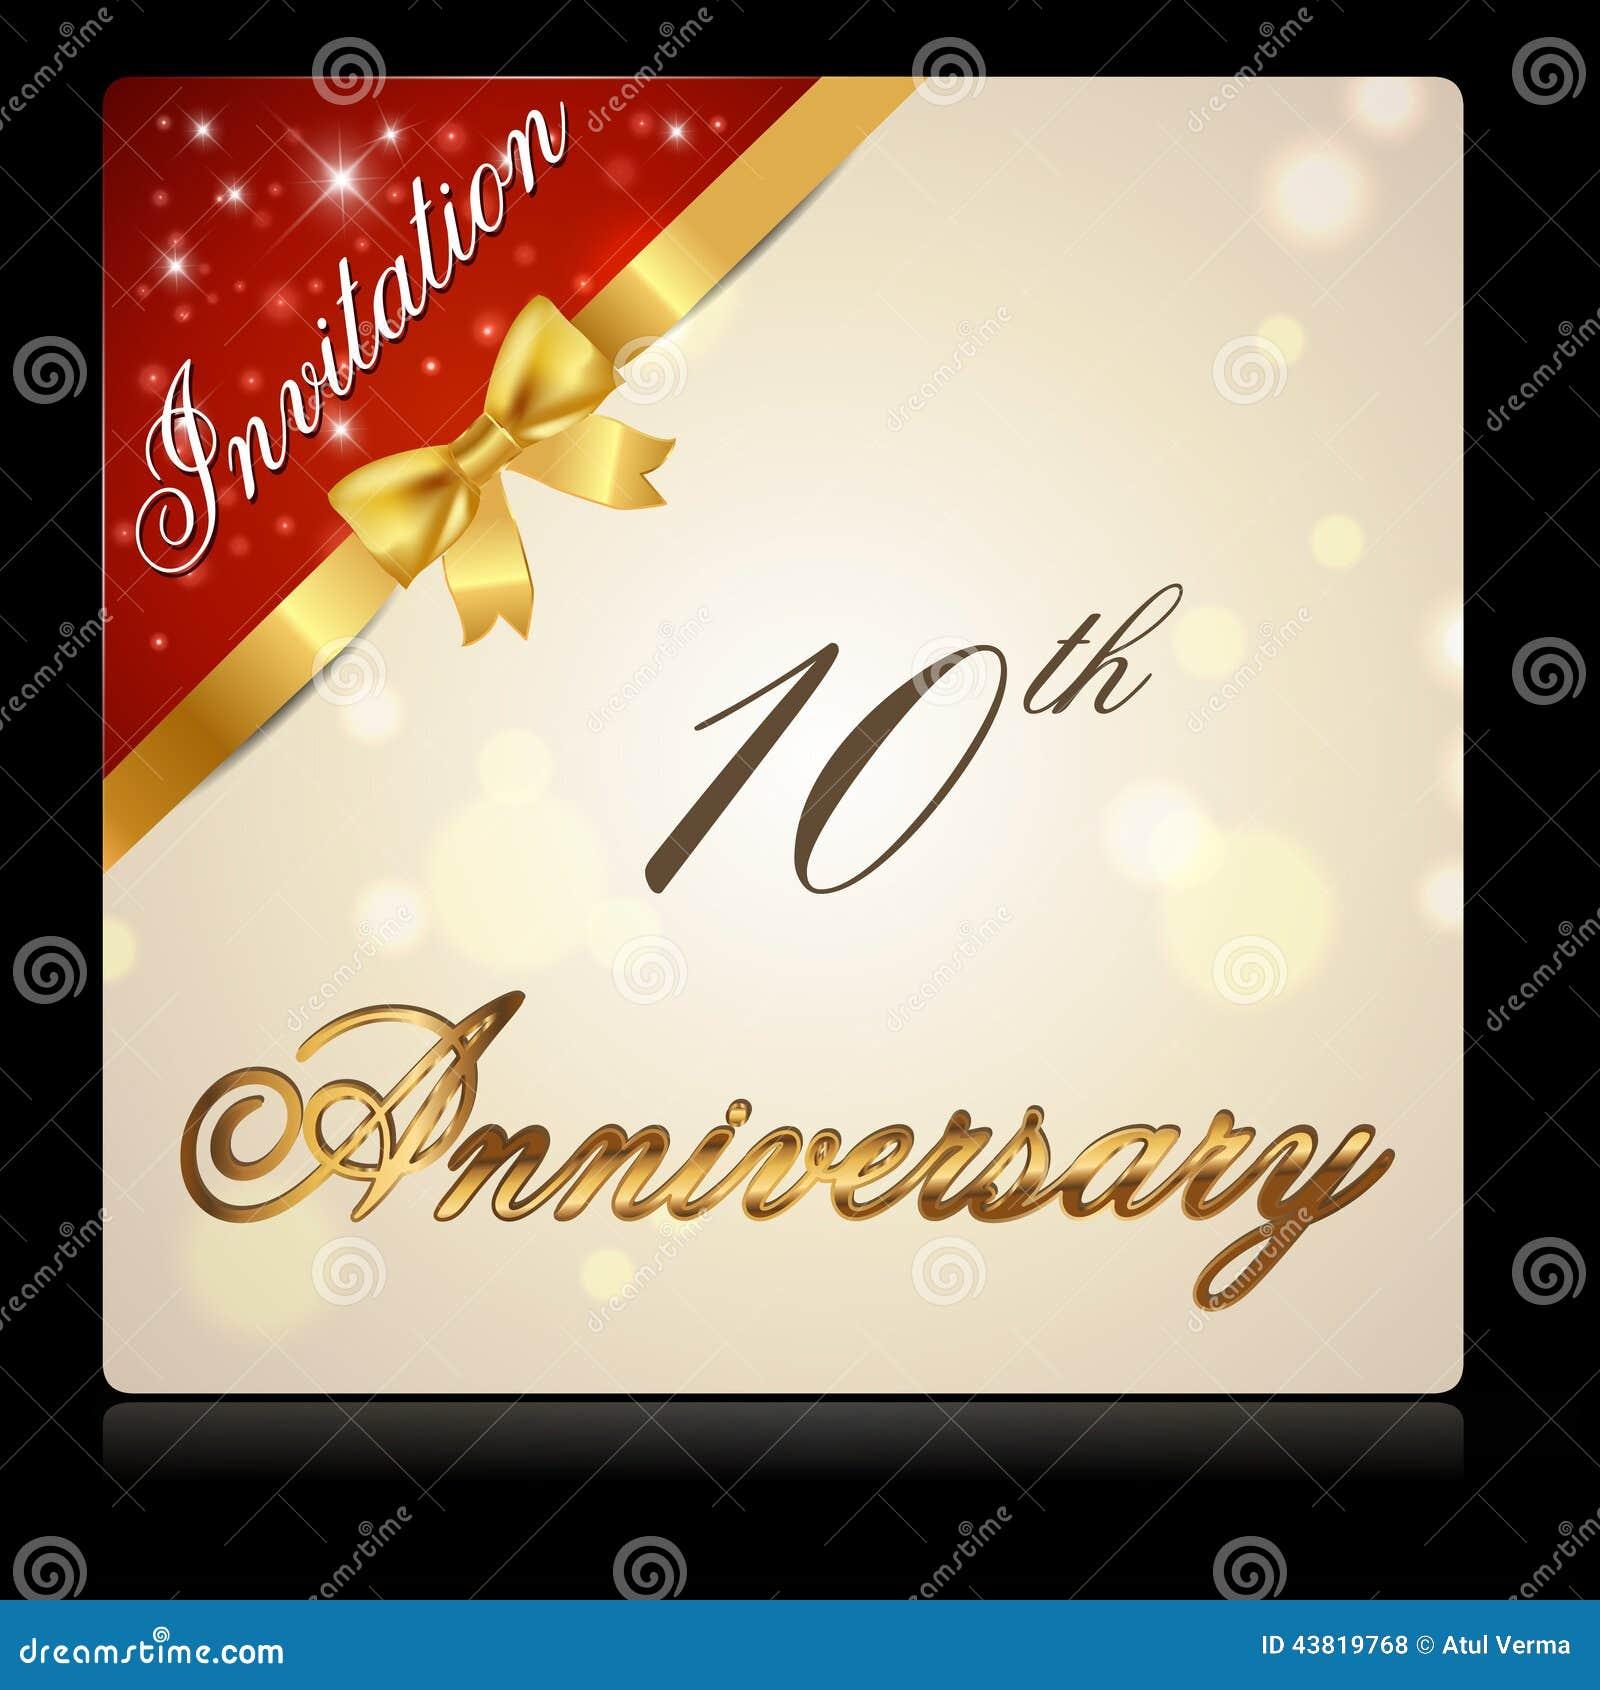 10 year anniversary with ribbon invitation card stock illustration 10 year anniversary with ribbon invitation card biocorpaavc Gallery